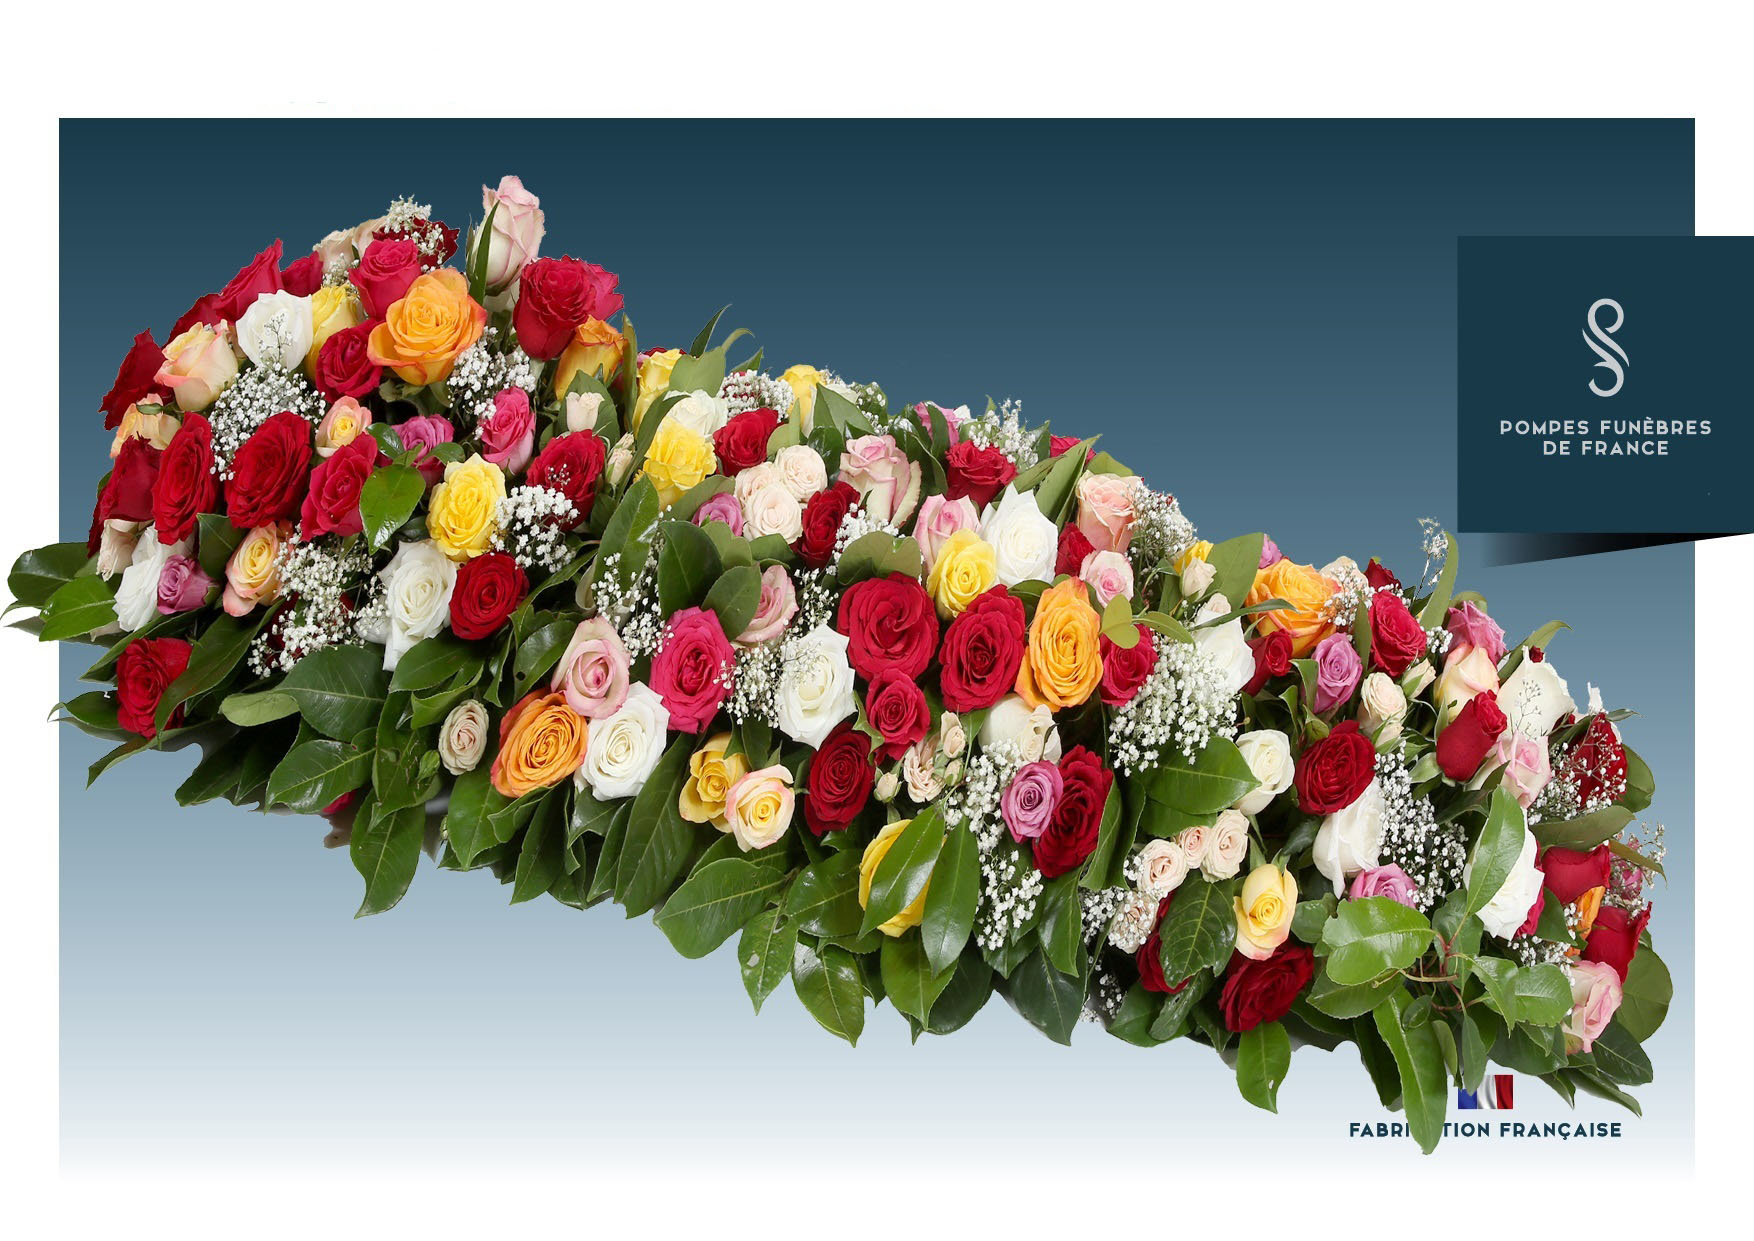 Dessus de cercueil ARC EN CIEL